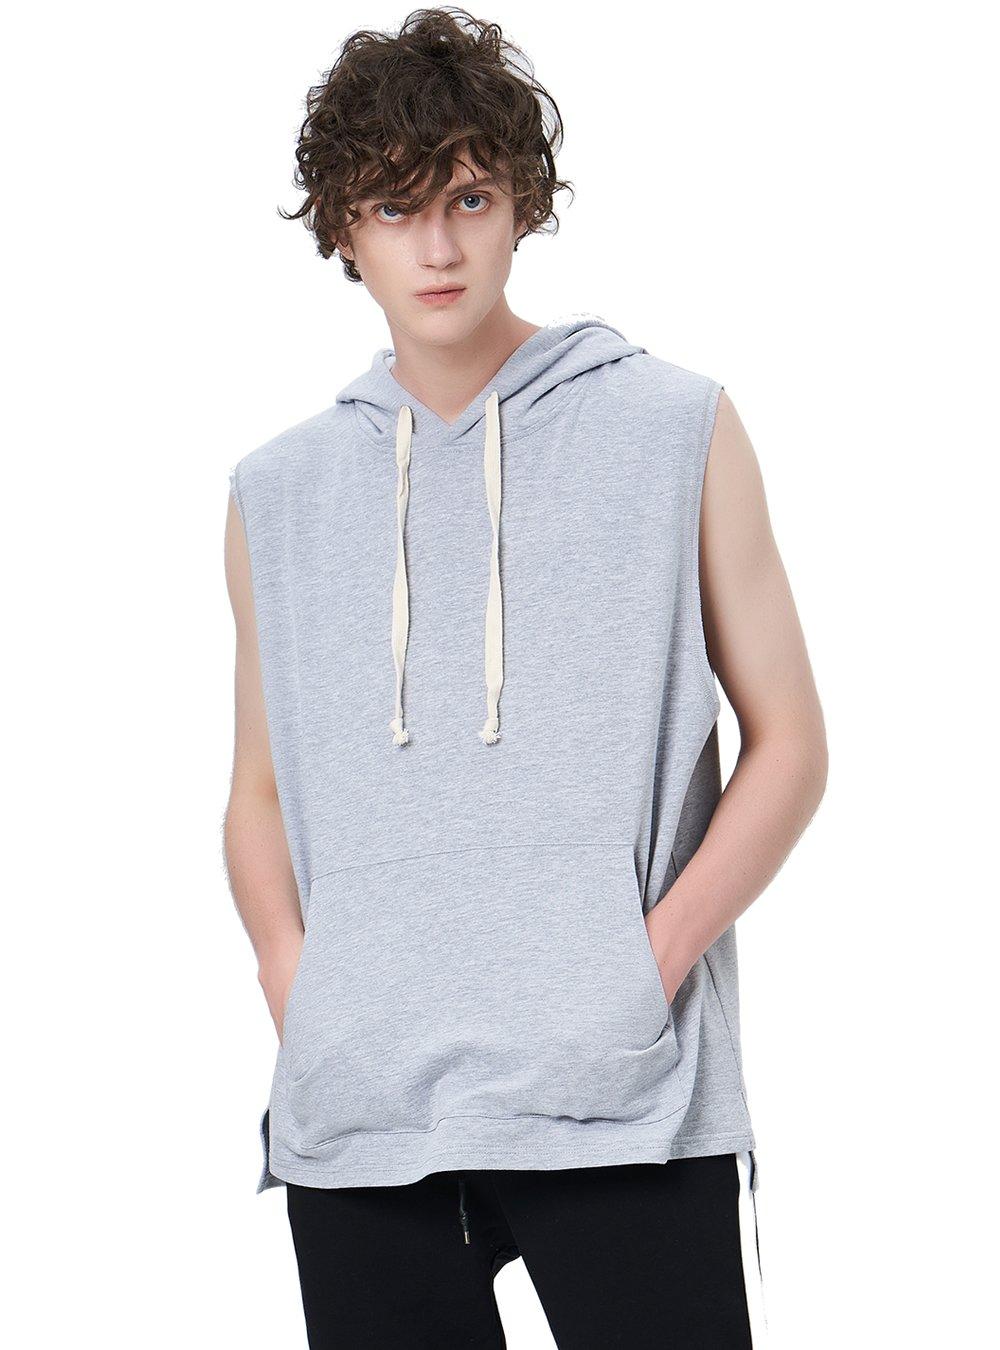 Zengjo Men's Sleeveless Hooded Hip Hop Tanktop Active Hipster Sportwear Sweatshirt Solid Drawstring Hoodie (Heather Grey-M)